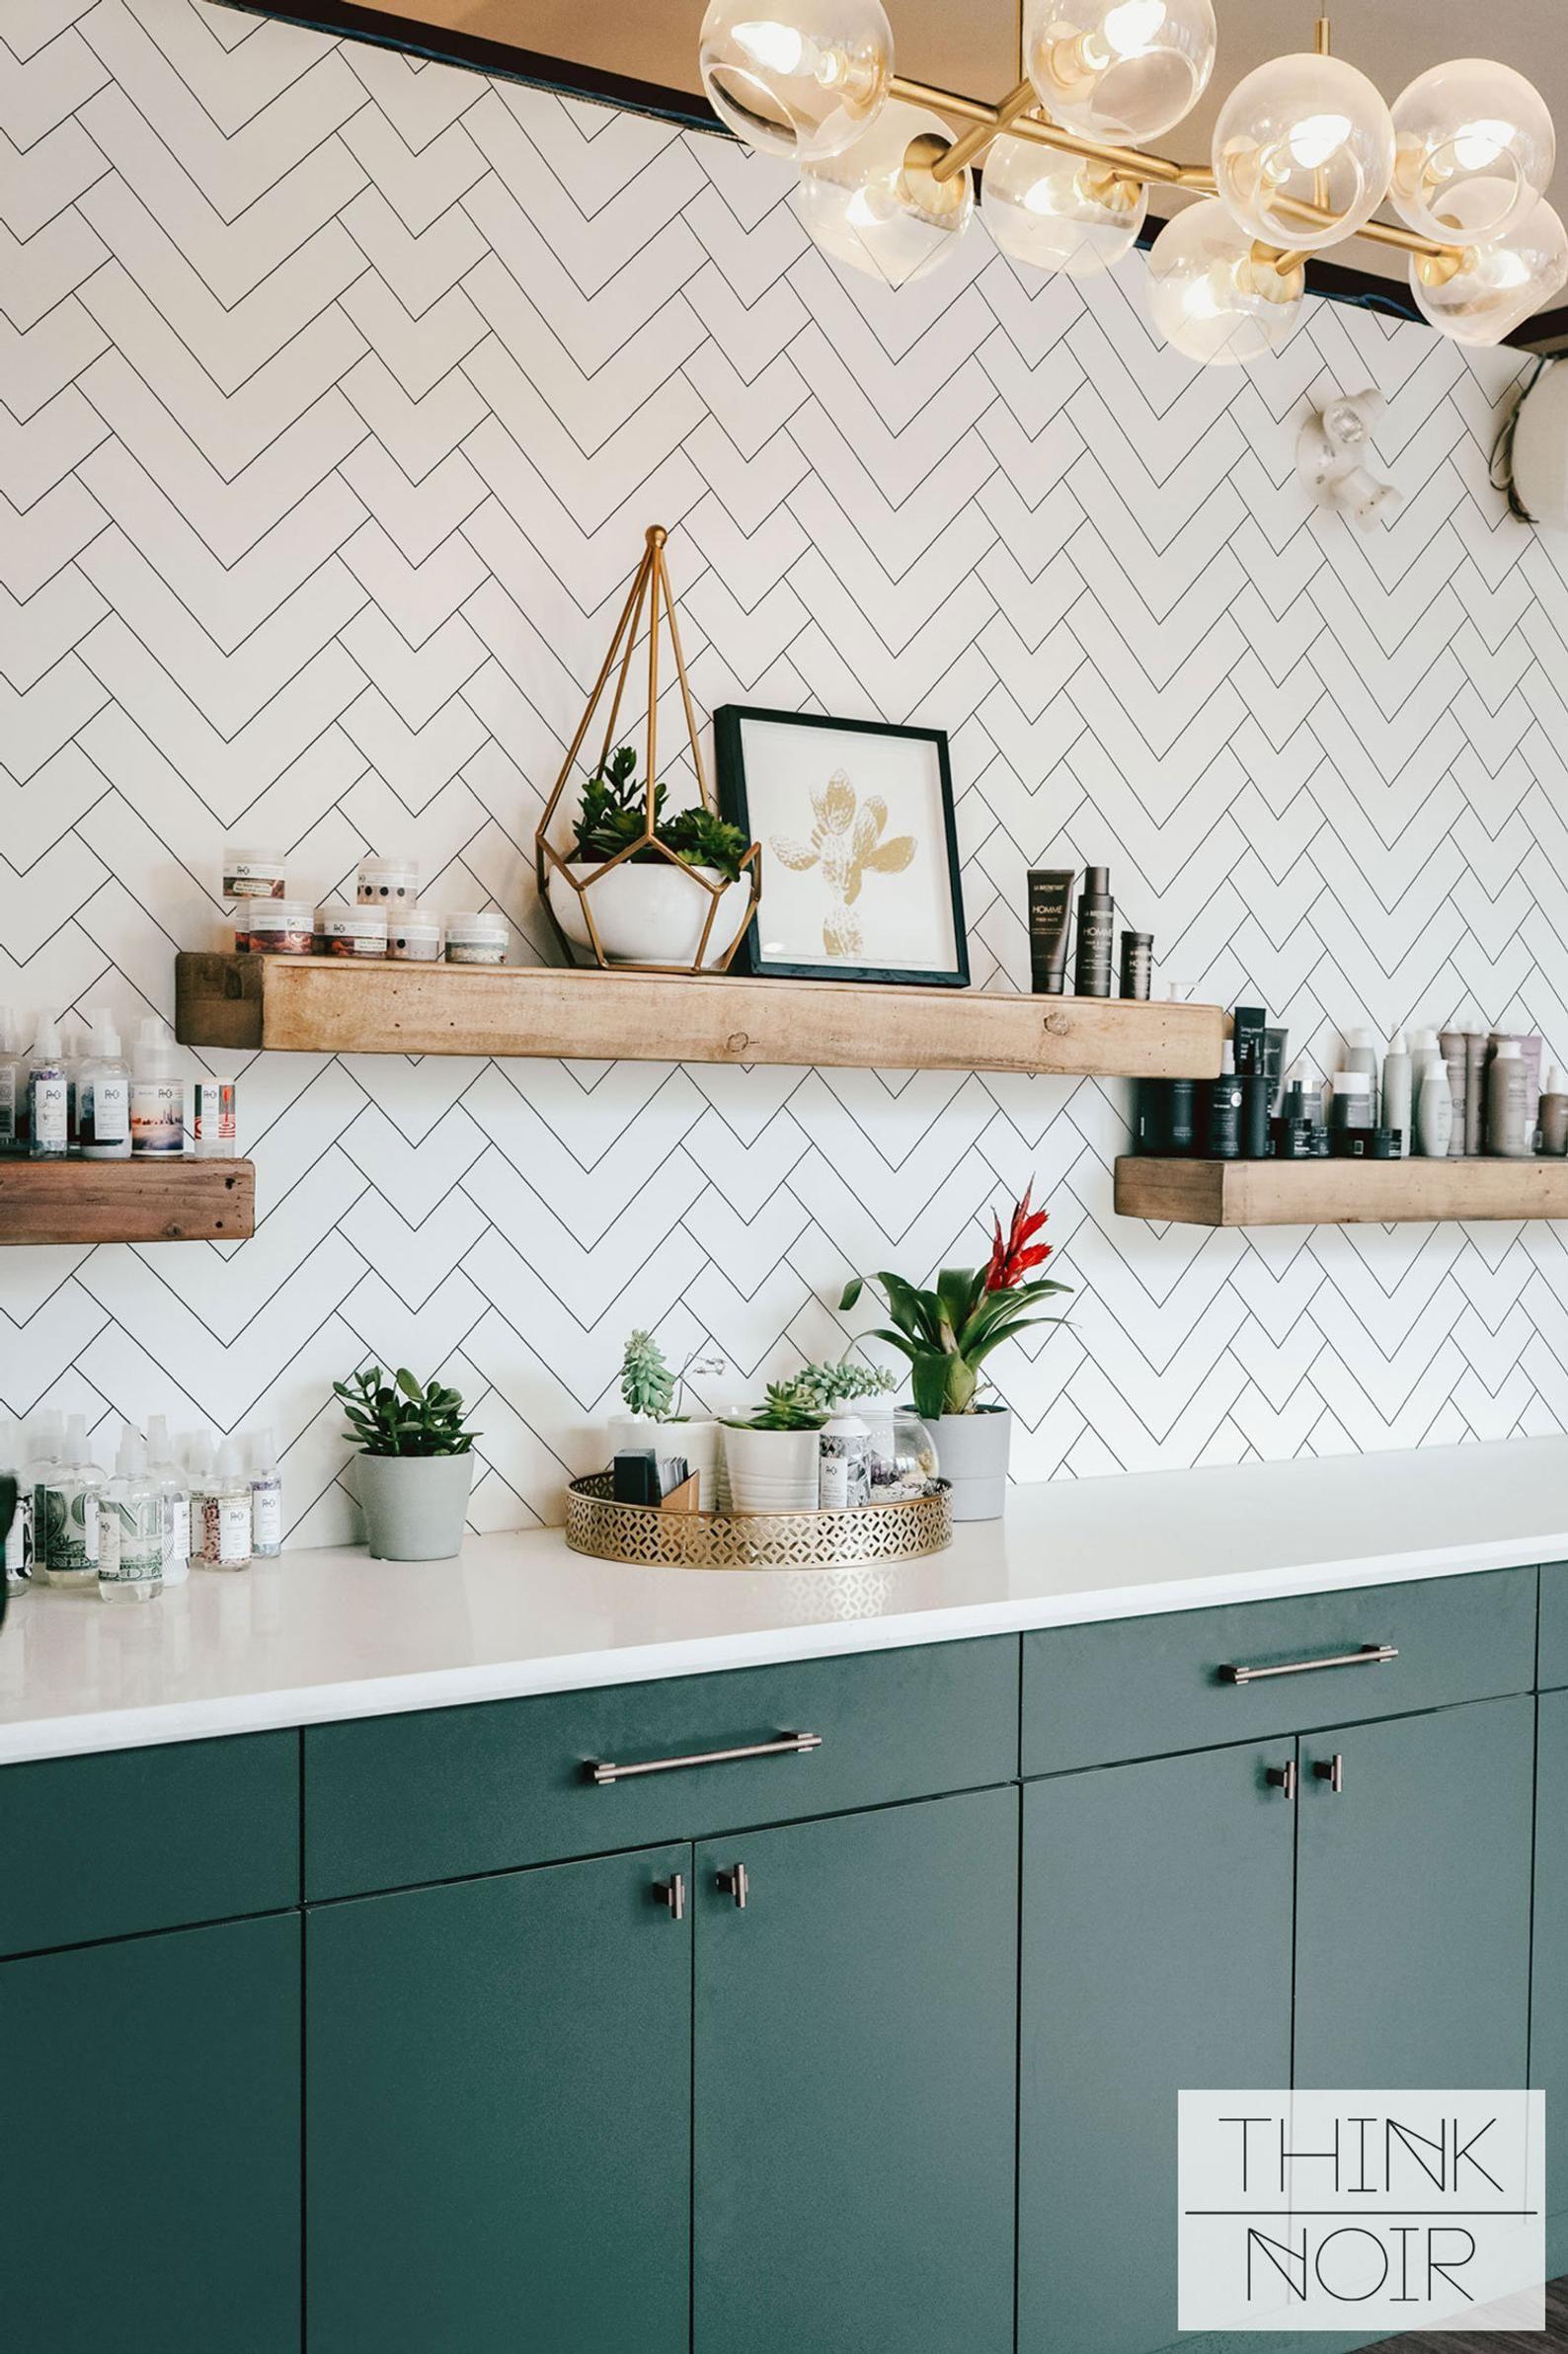 Minimalistic Geometric Pattern Regular Wallpaper Simple Etsy Kitchen Wallpaper Herringbone Wallpaper Kitchen Design